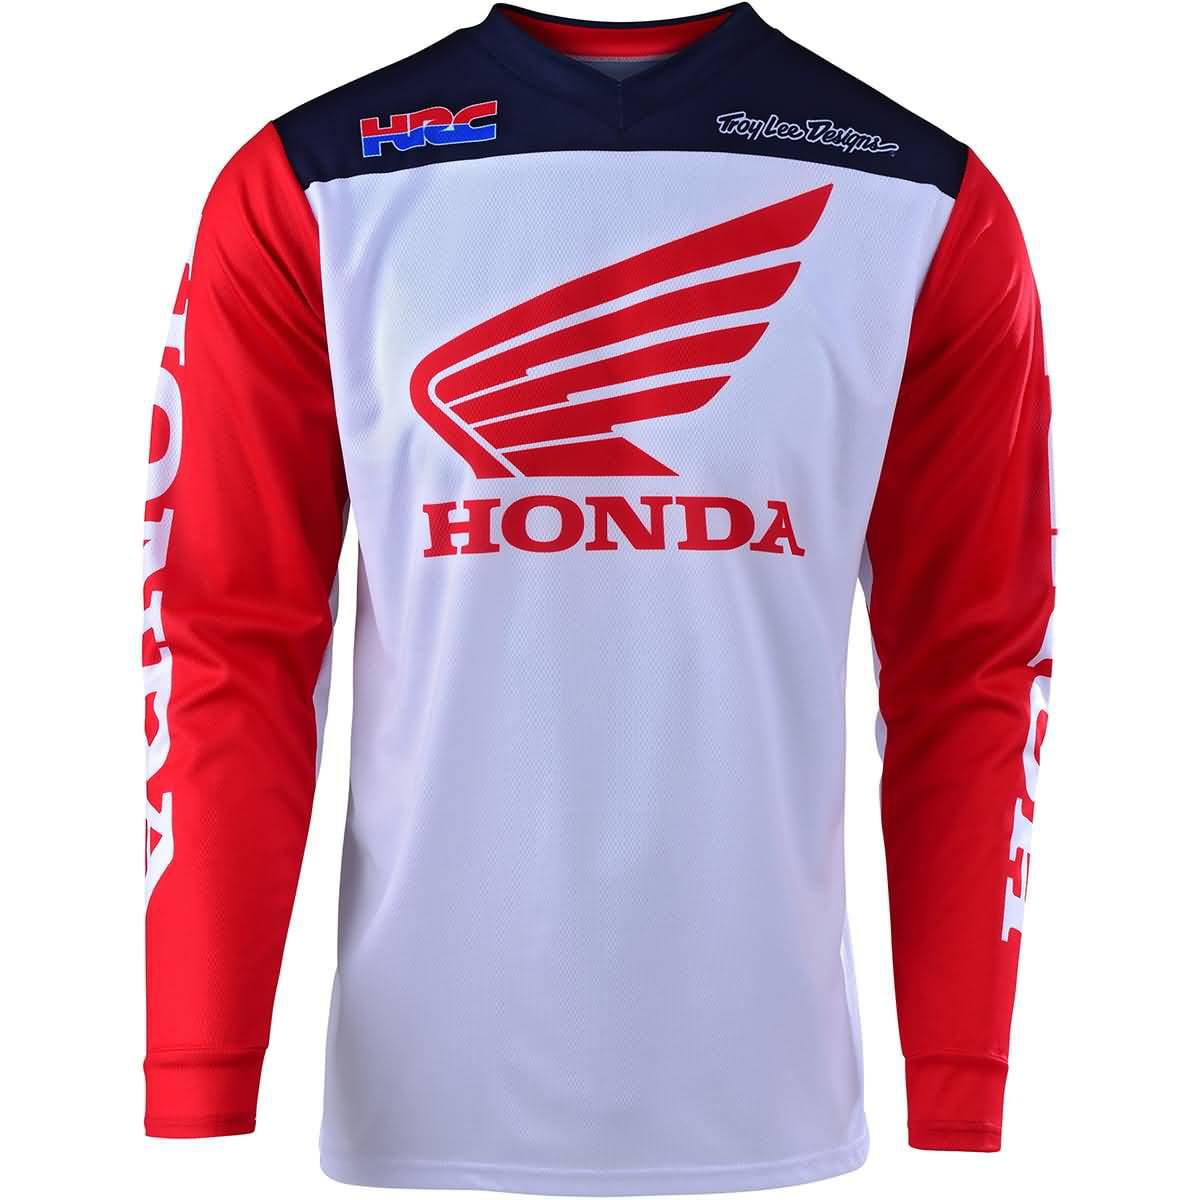 Troy Lee Designs Gp Honda Motocross Jersey Walmart Com Walmart Com